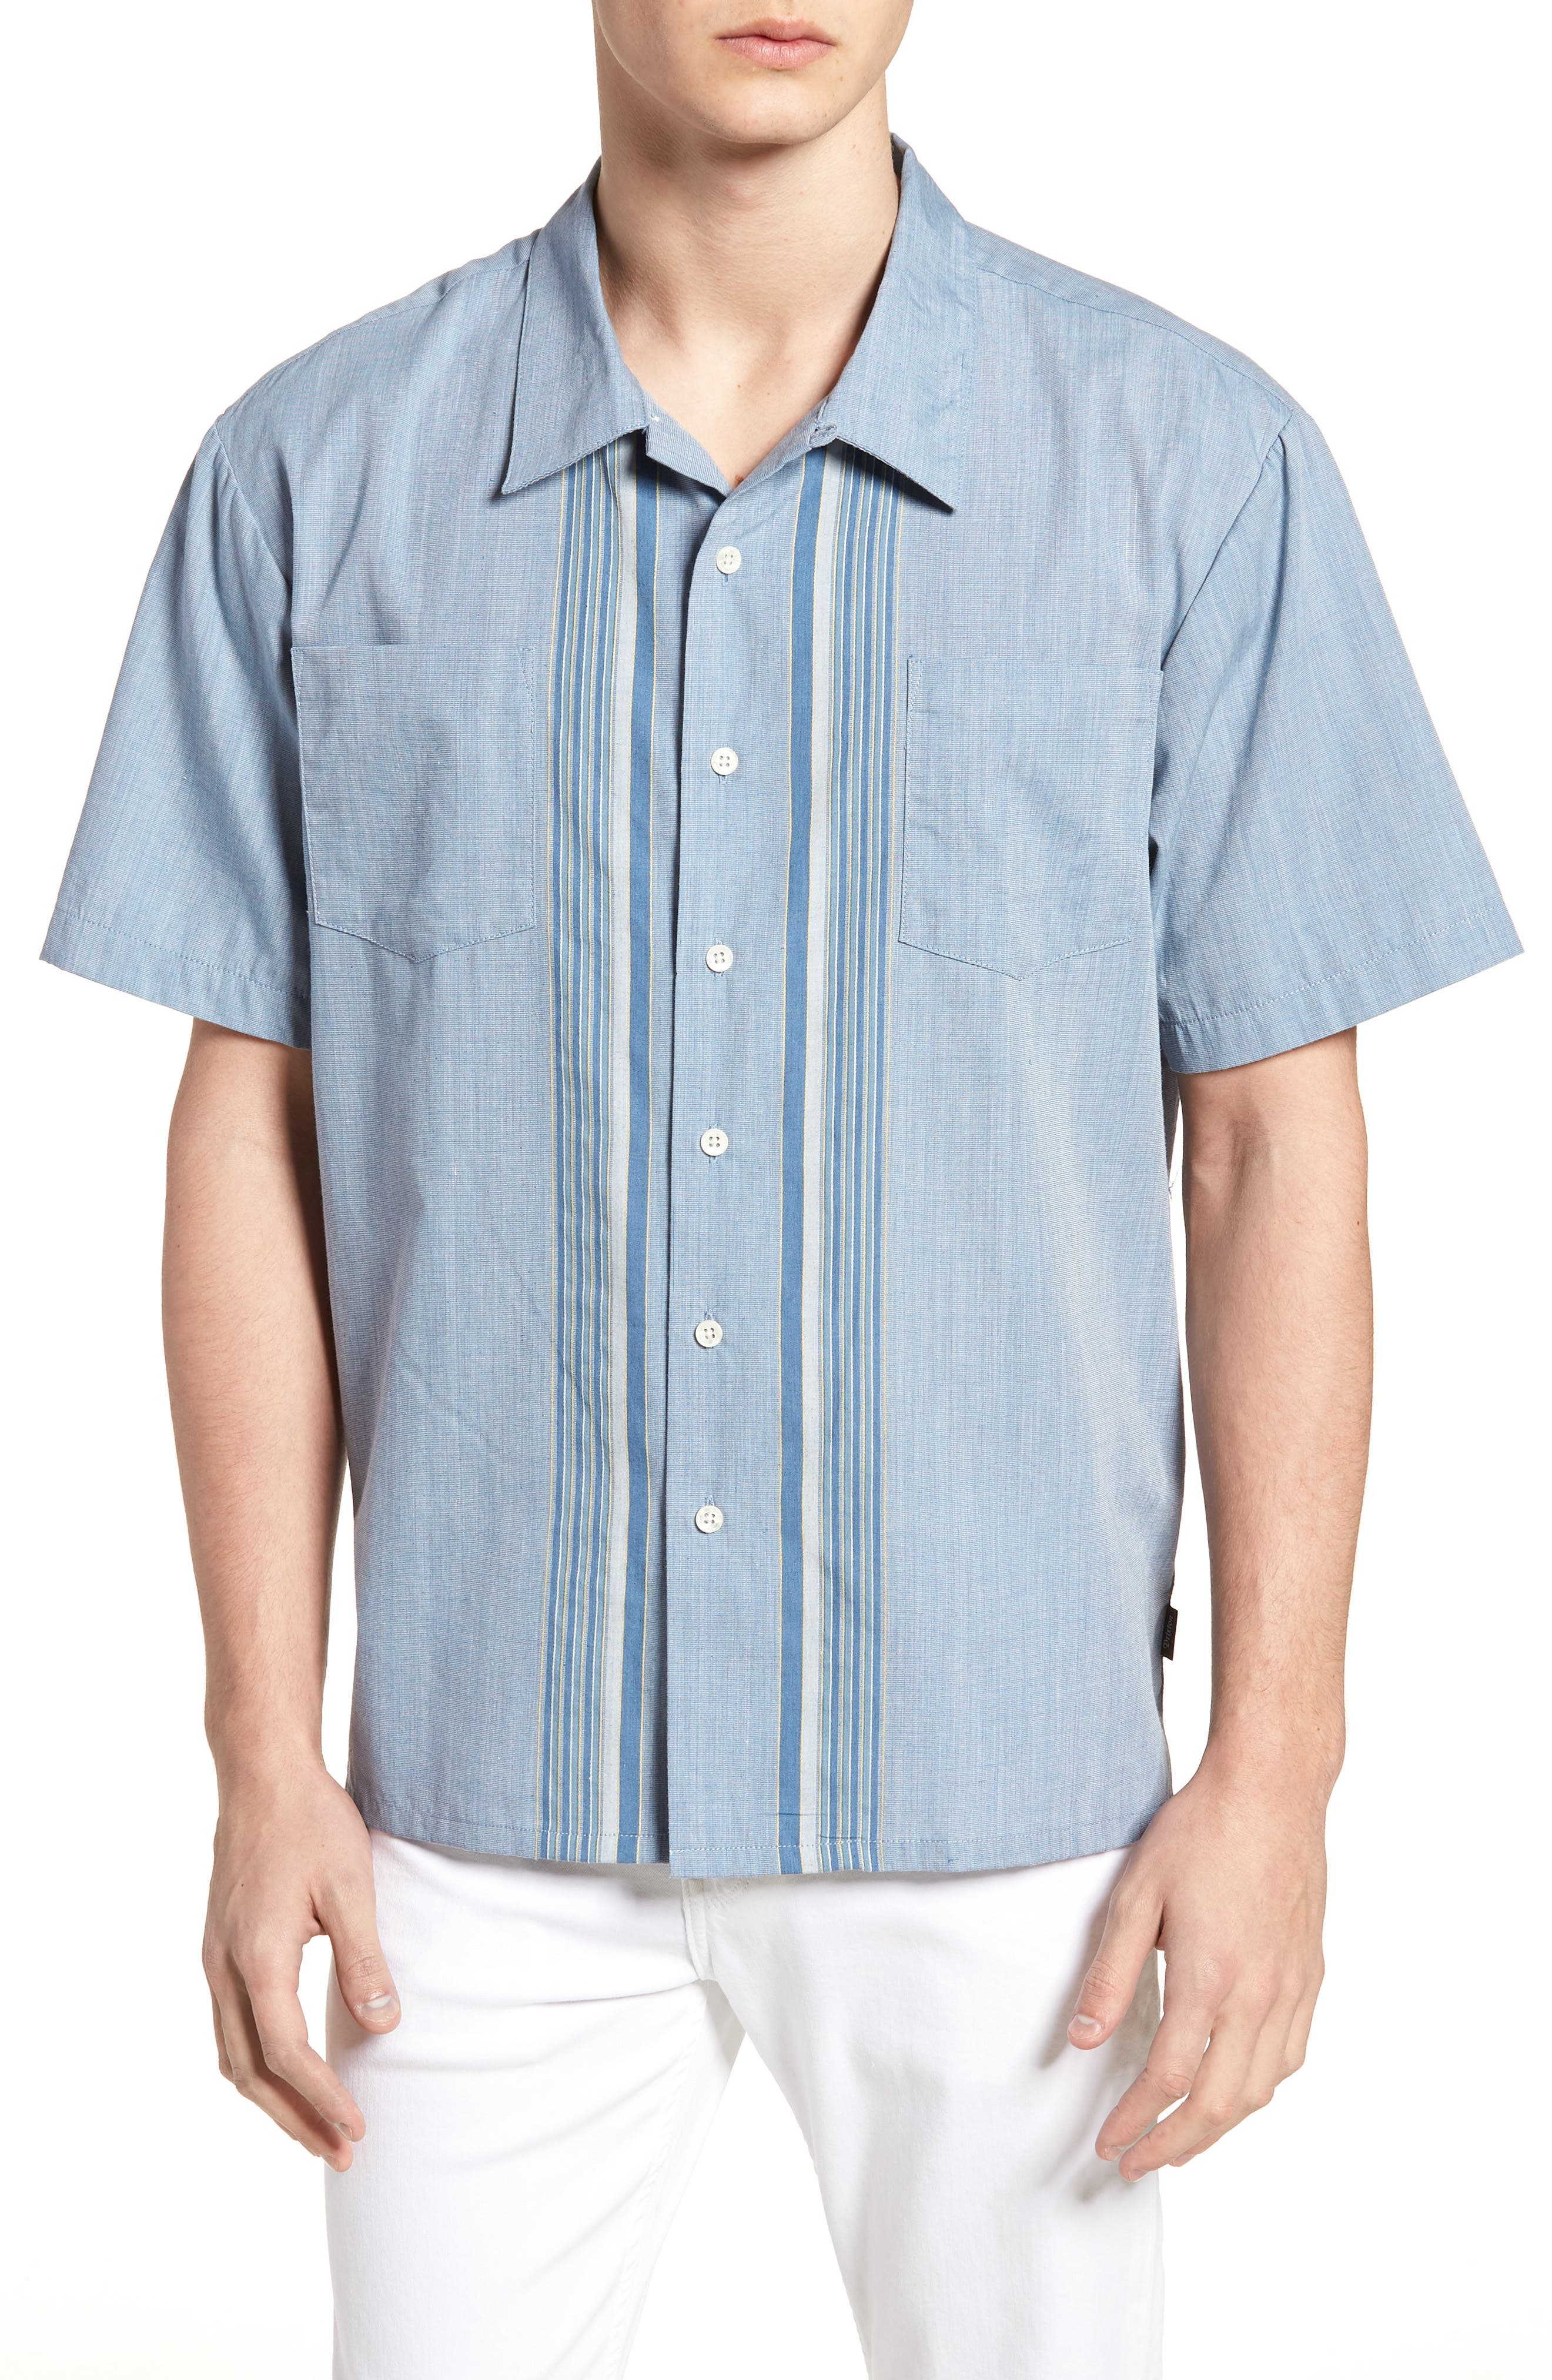 Cruze Woven Shirt,                         Main,                         color, LIGHT BLUE